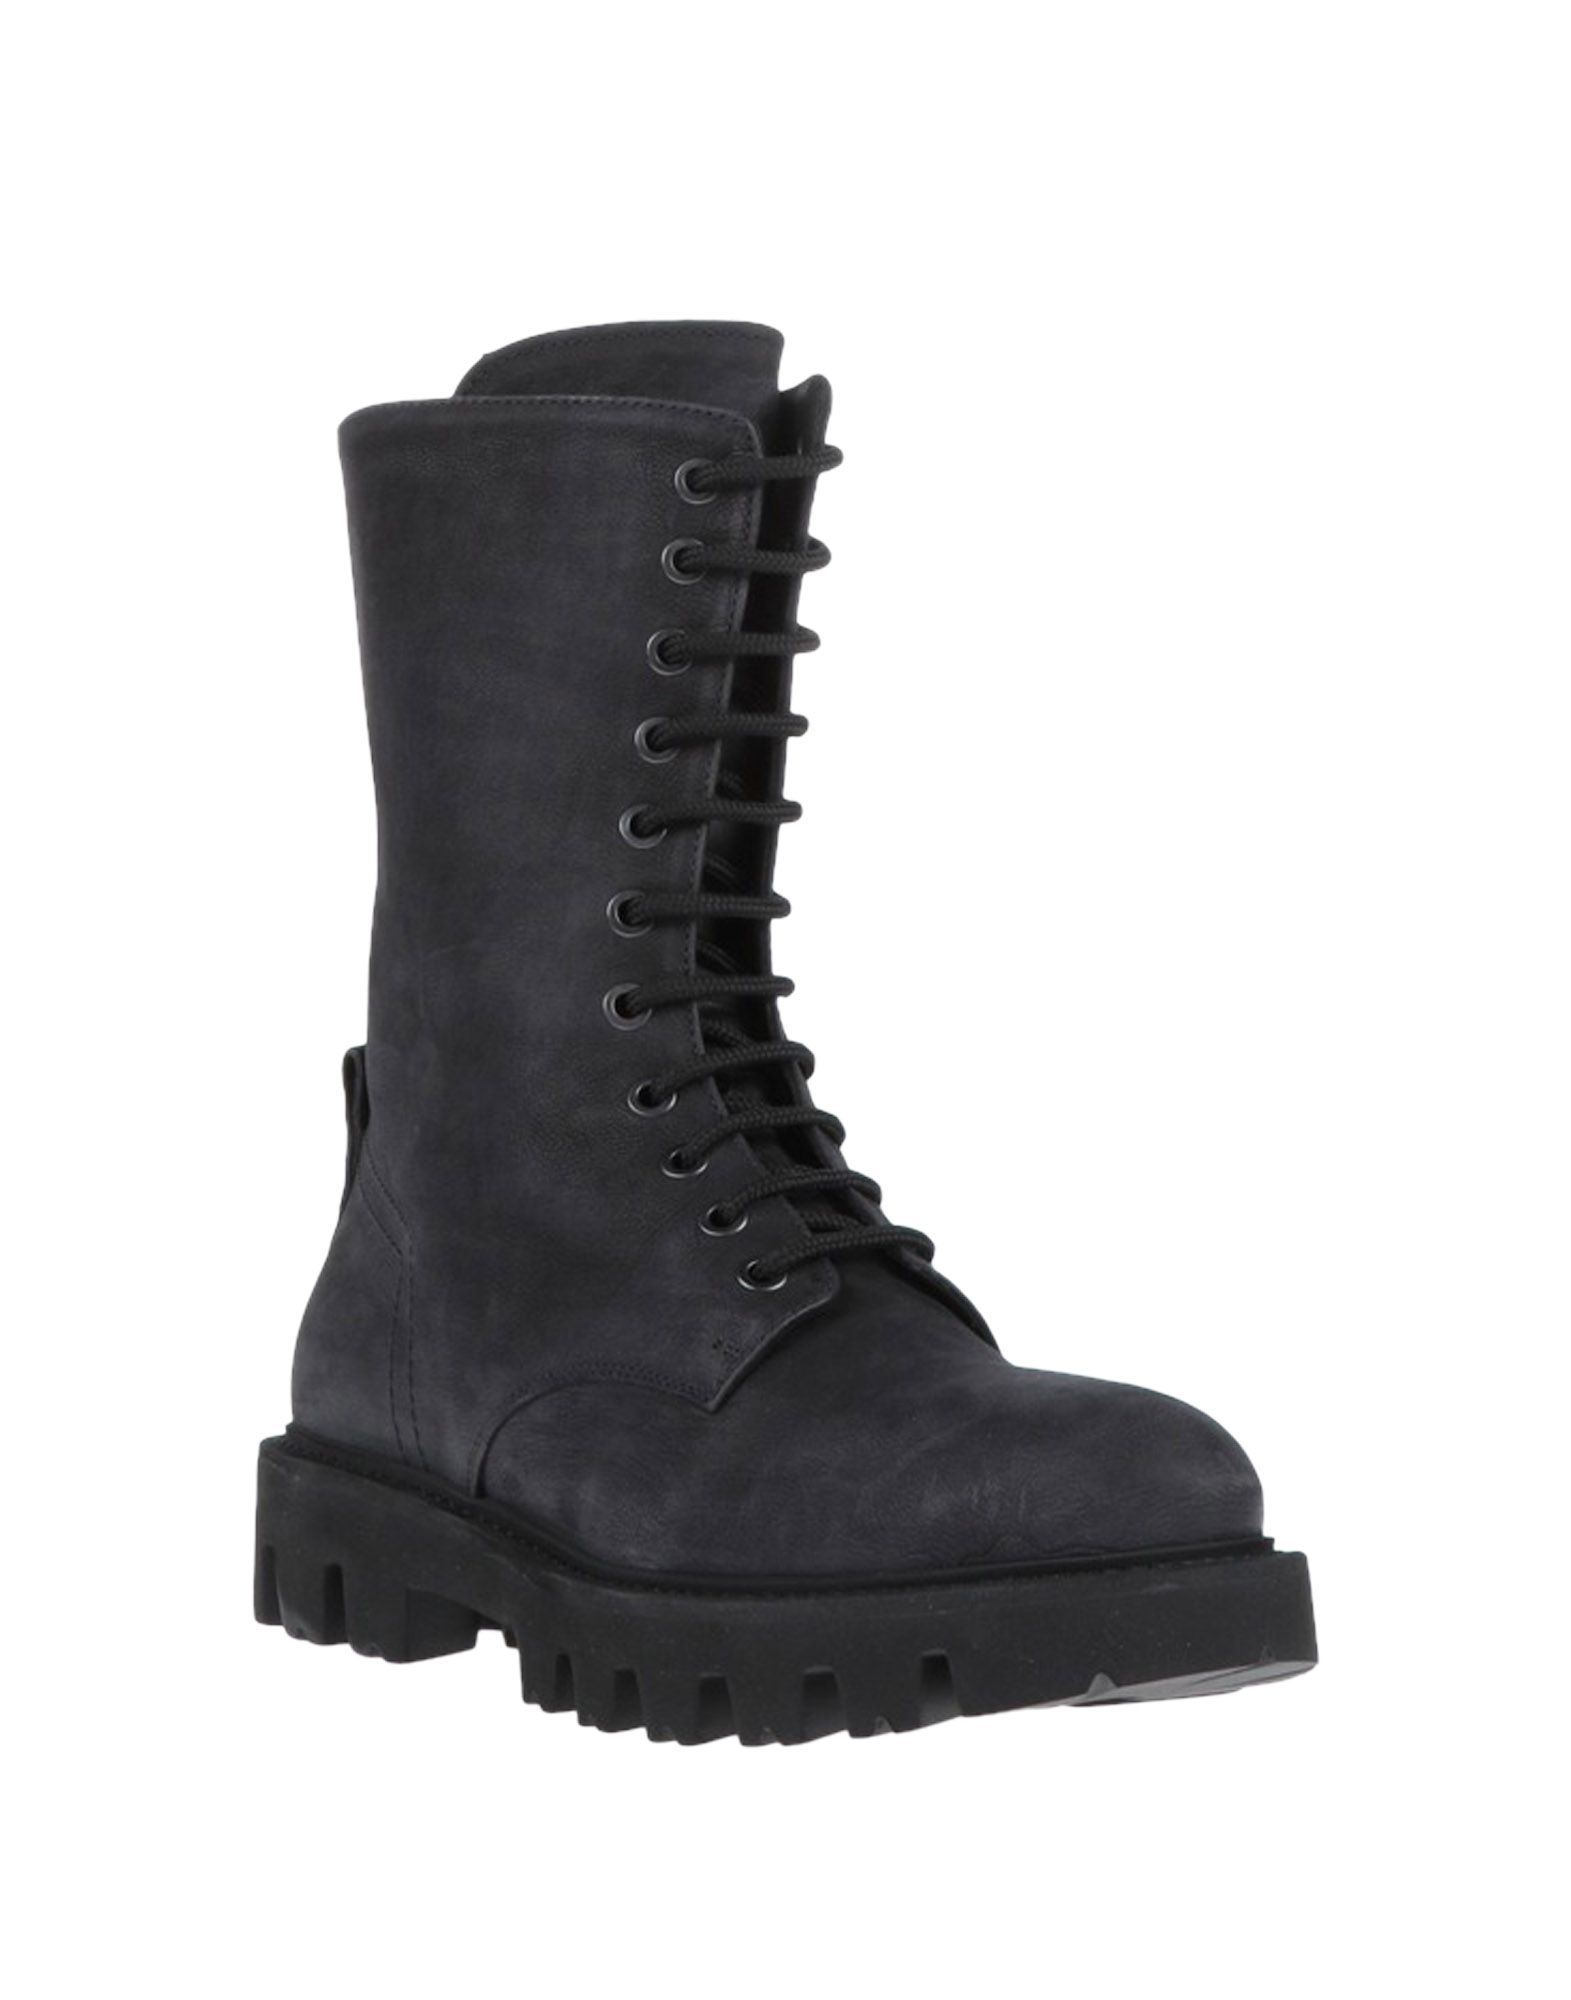 Bruno Bordese Stiefelette Damen  Schuhe 11529054ML Beliebte Schuhe  837fae